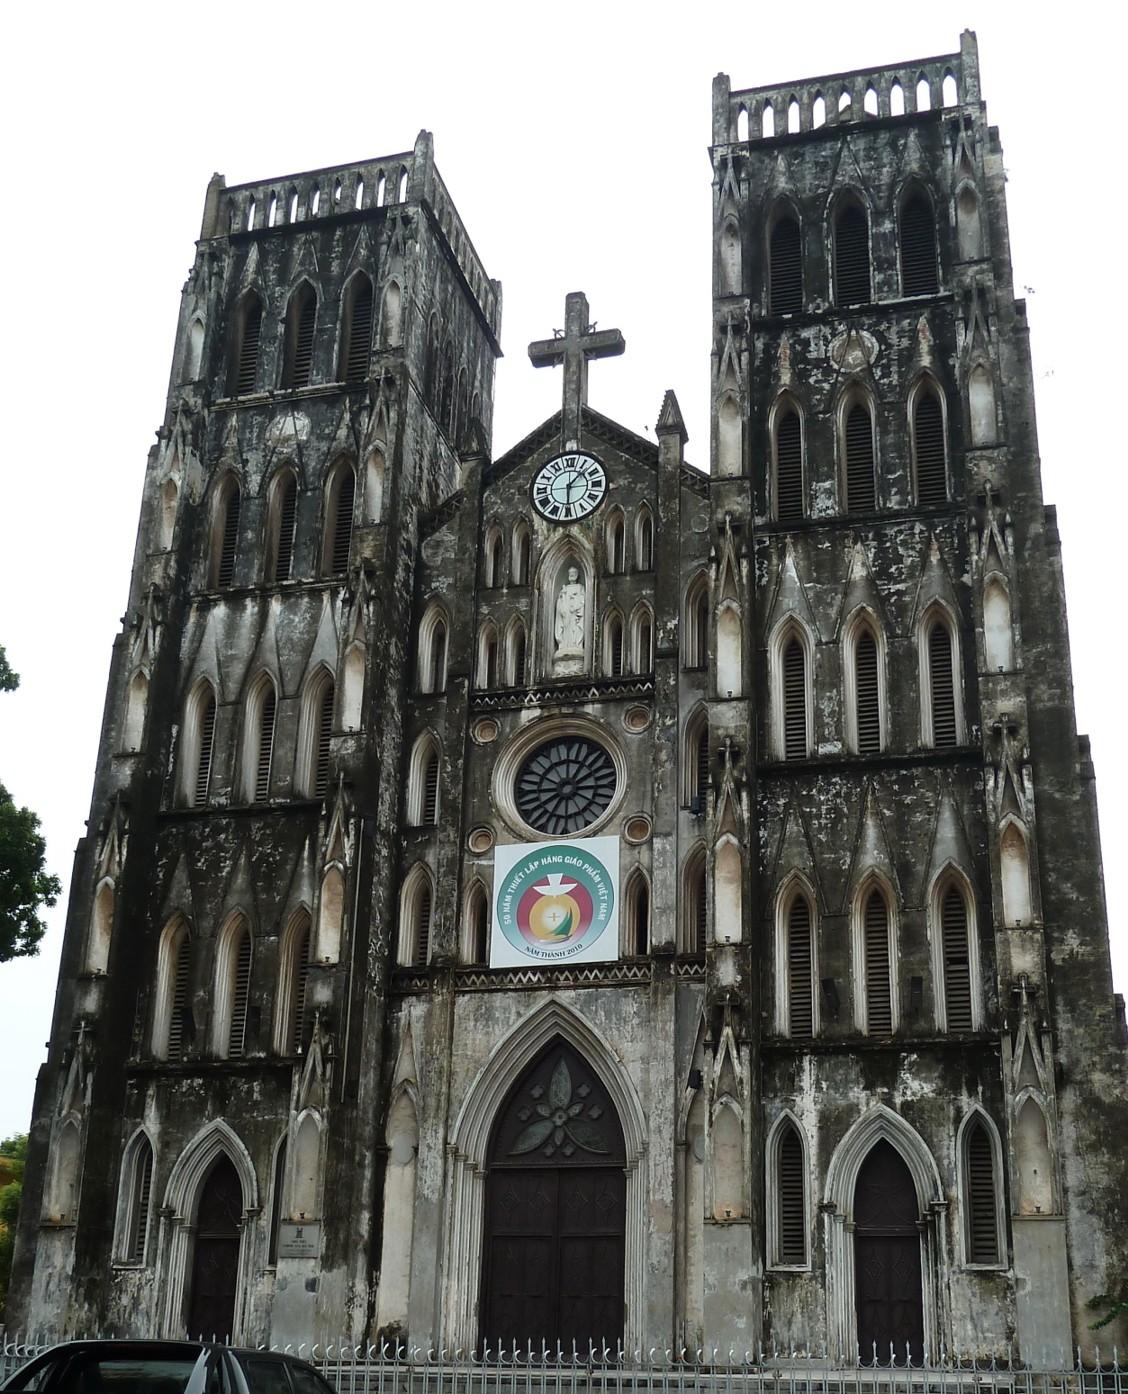 Name:St. Joseph Cathedral Original source: https://en.wikipedia.org/wiki/St._Joseph%27s_Cathedral,_Hanoi